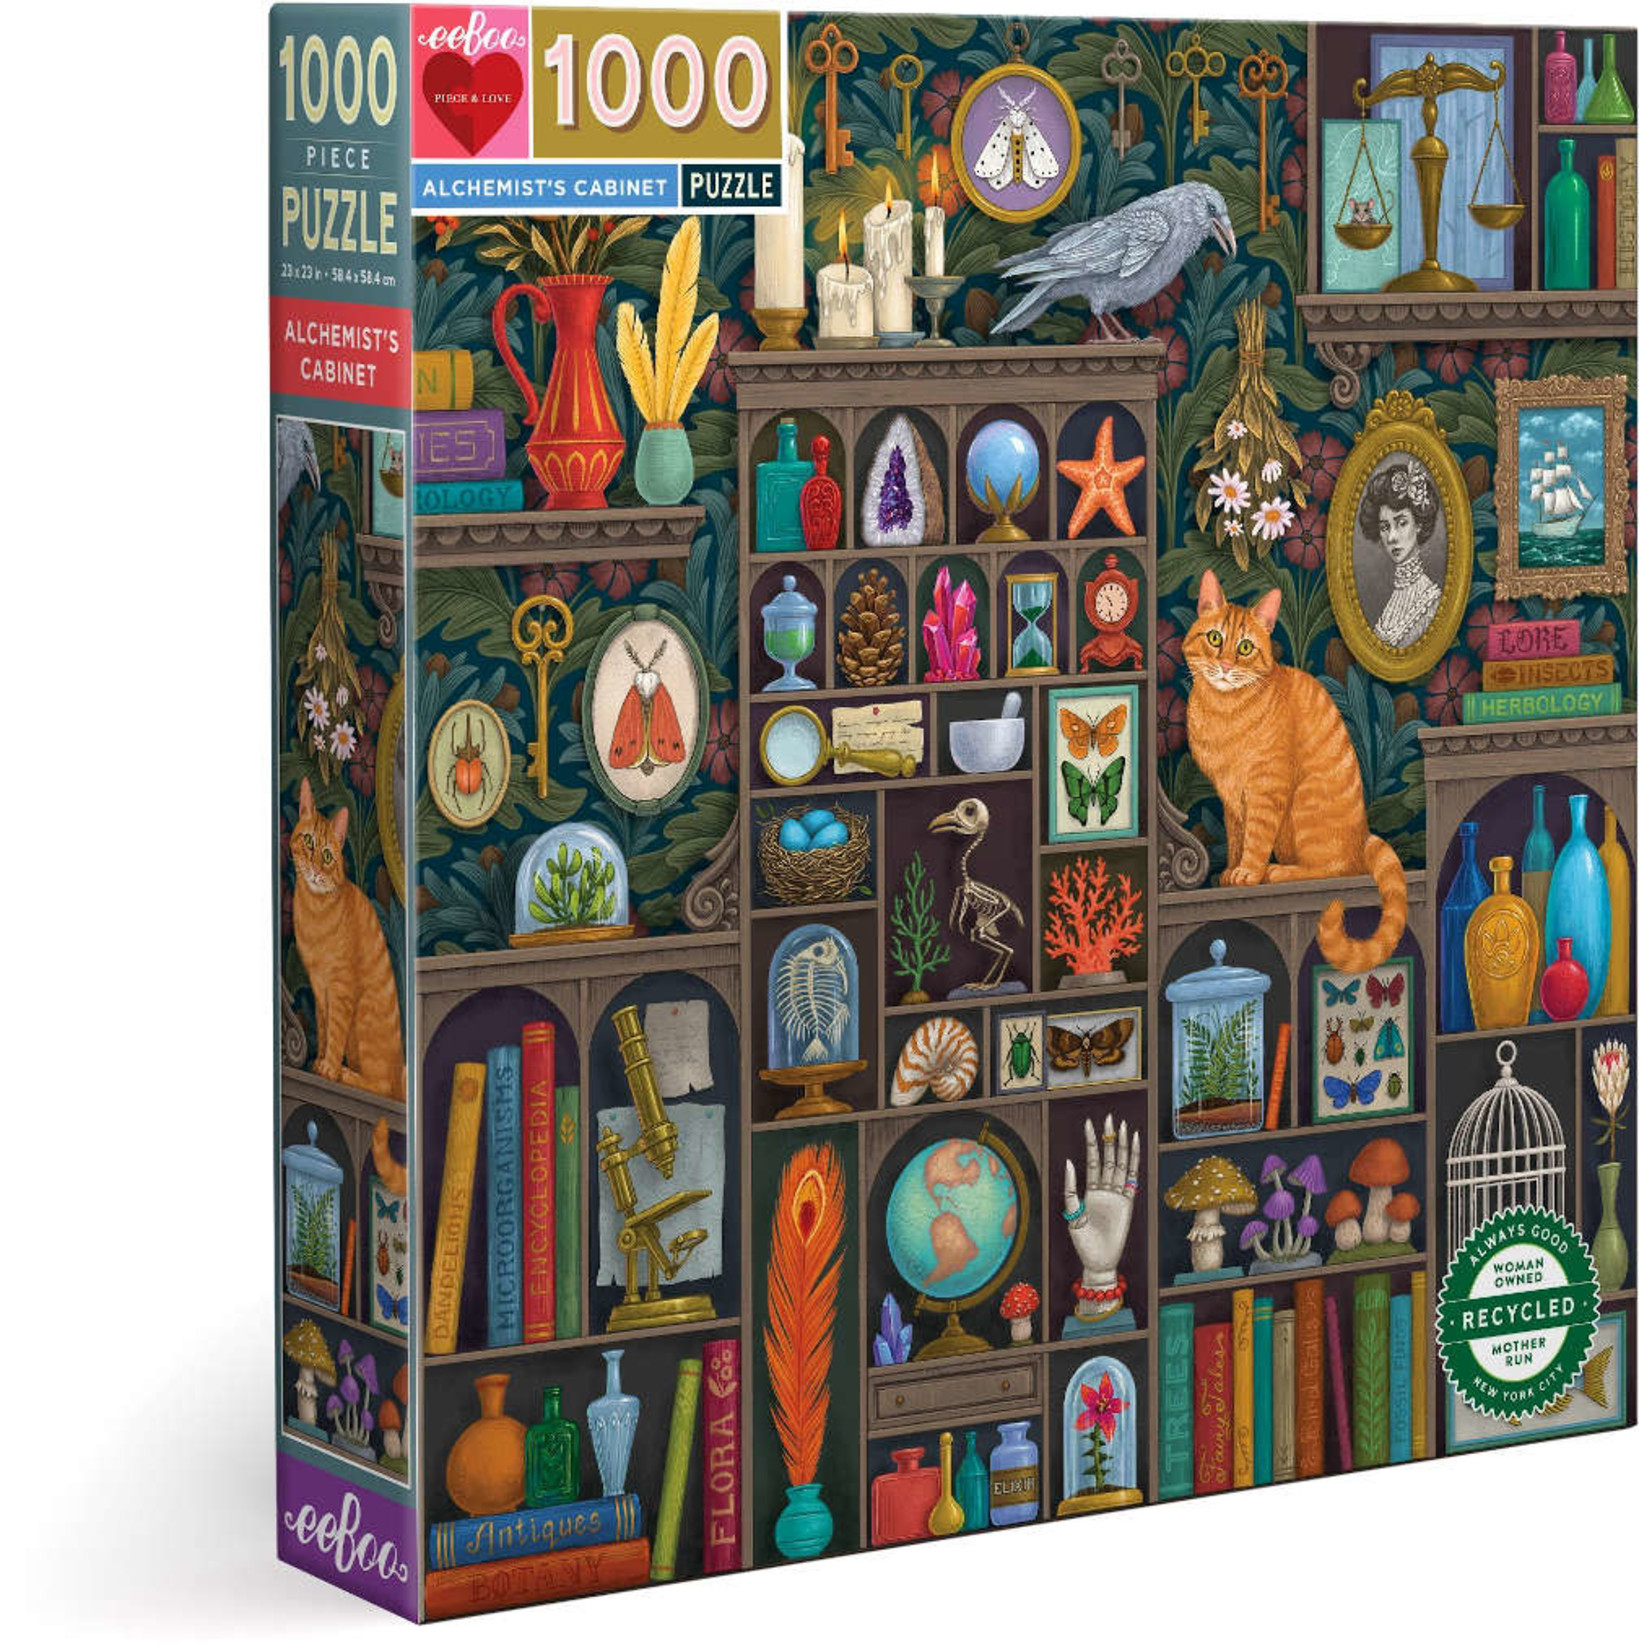 EEBOO Alchemist's Cabinet 1000 Pc Sq Puzzle